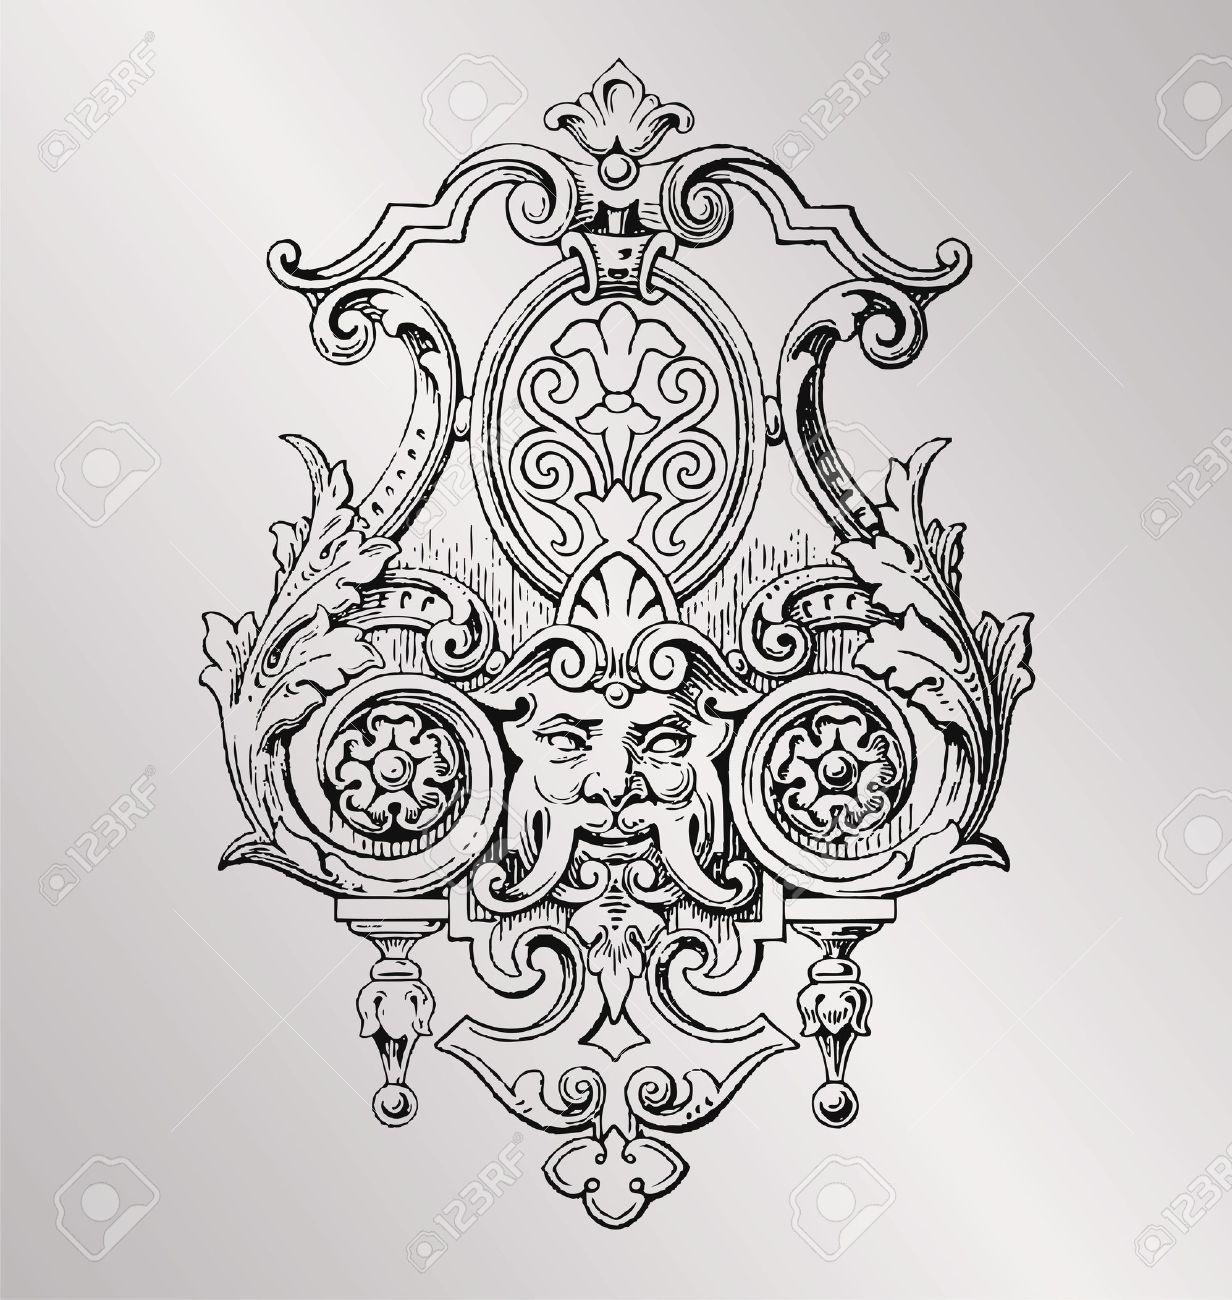 Vintage style baroque engraving decoration